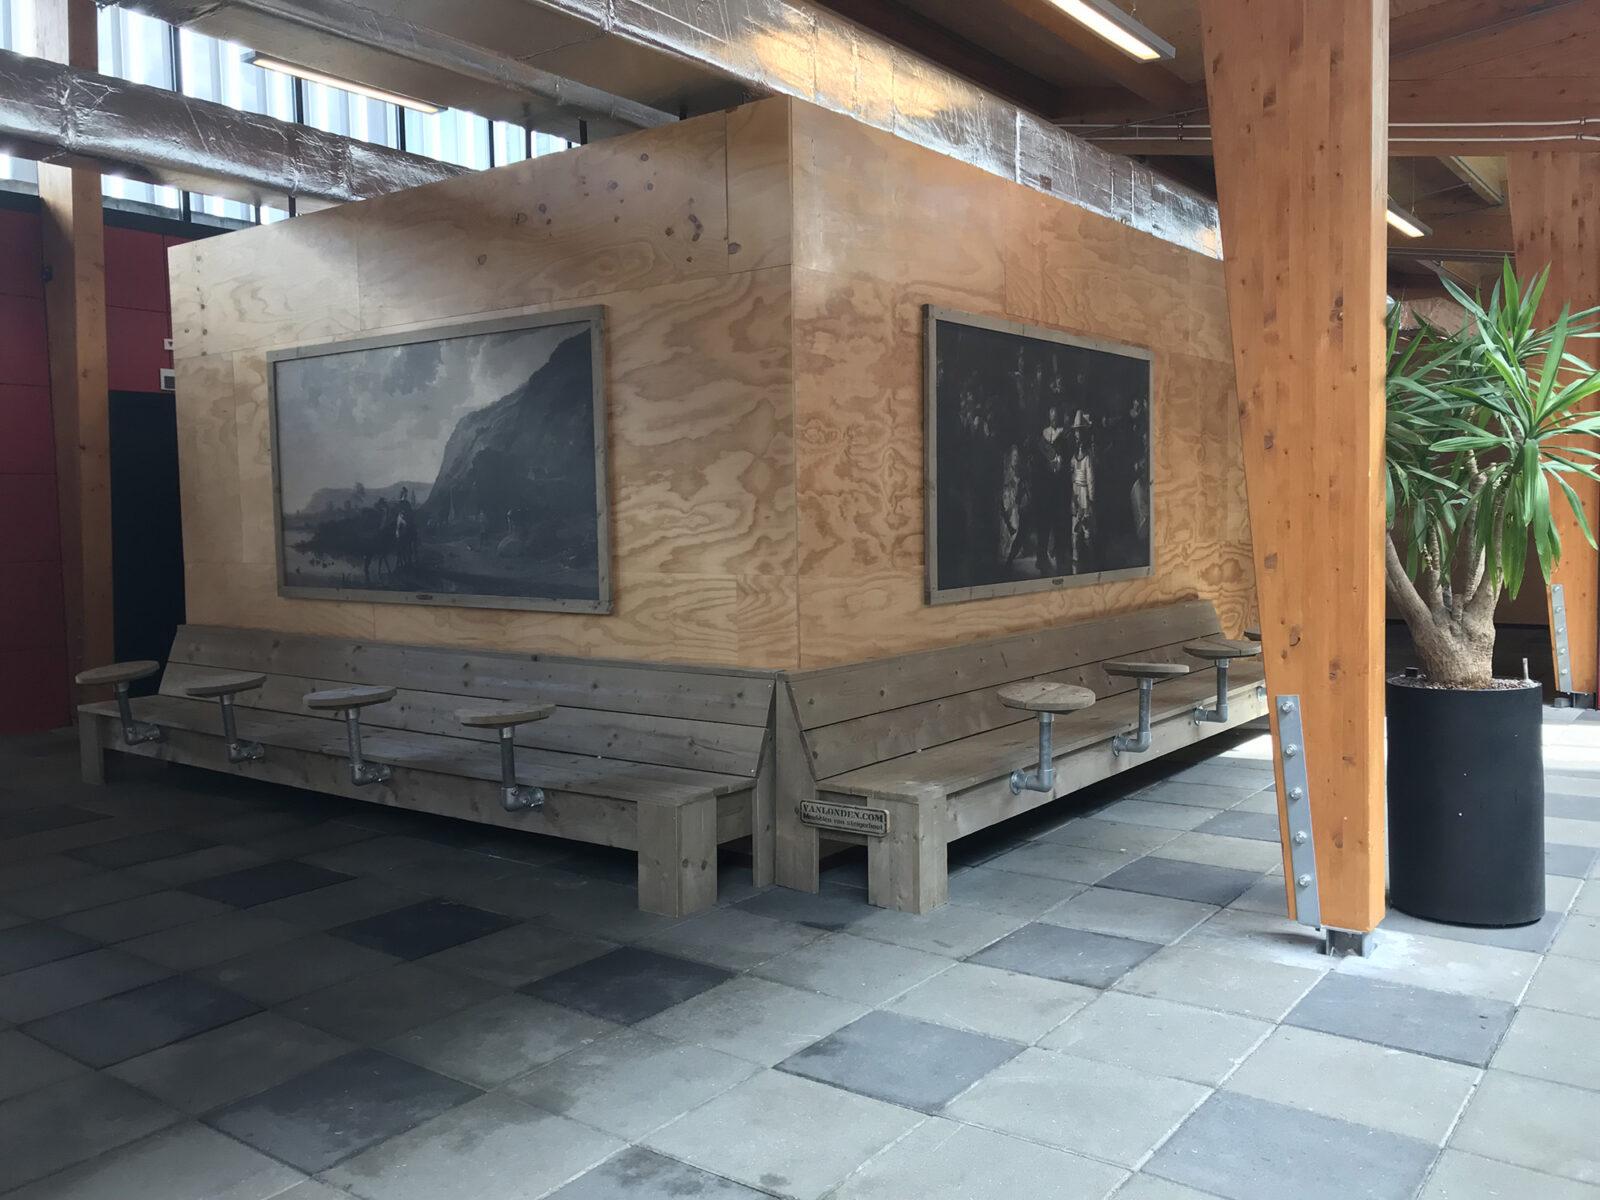 studieplek_V-Building 1